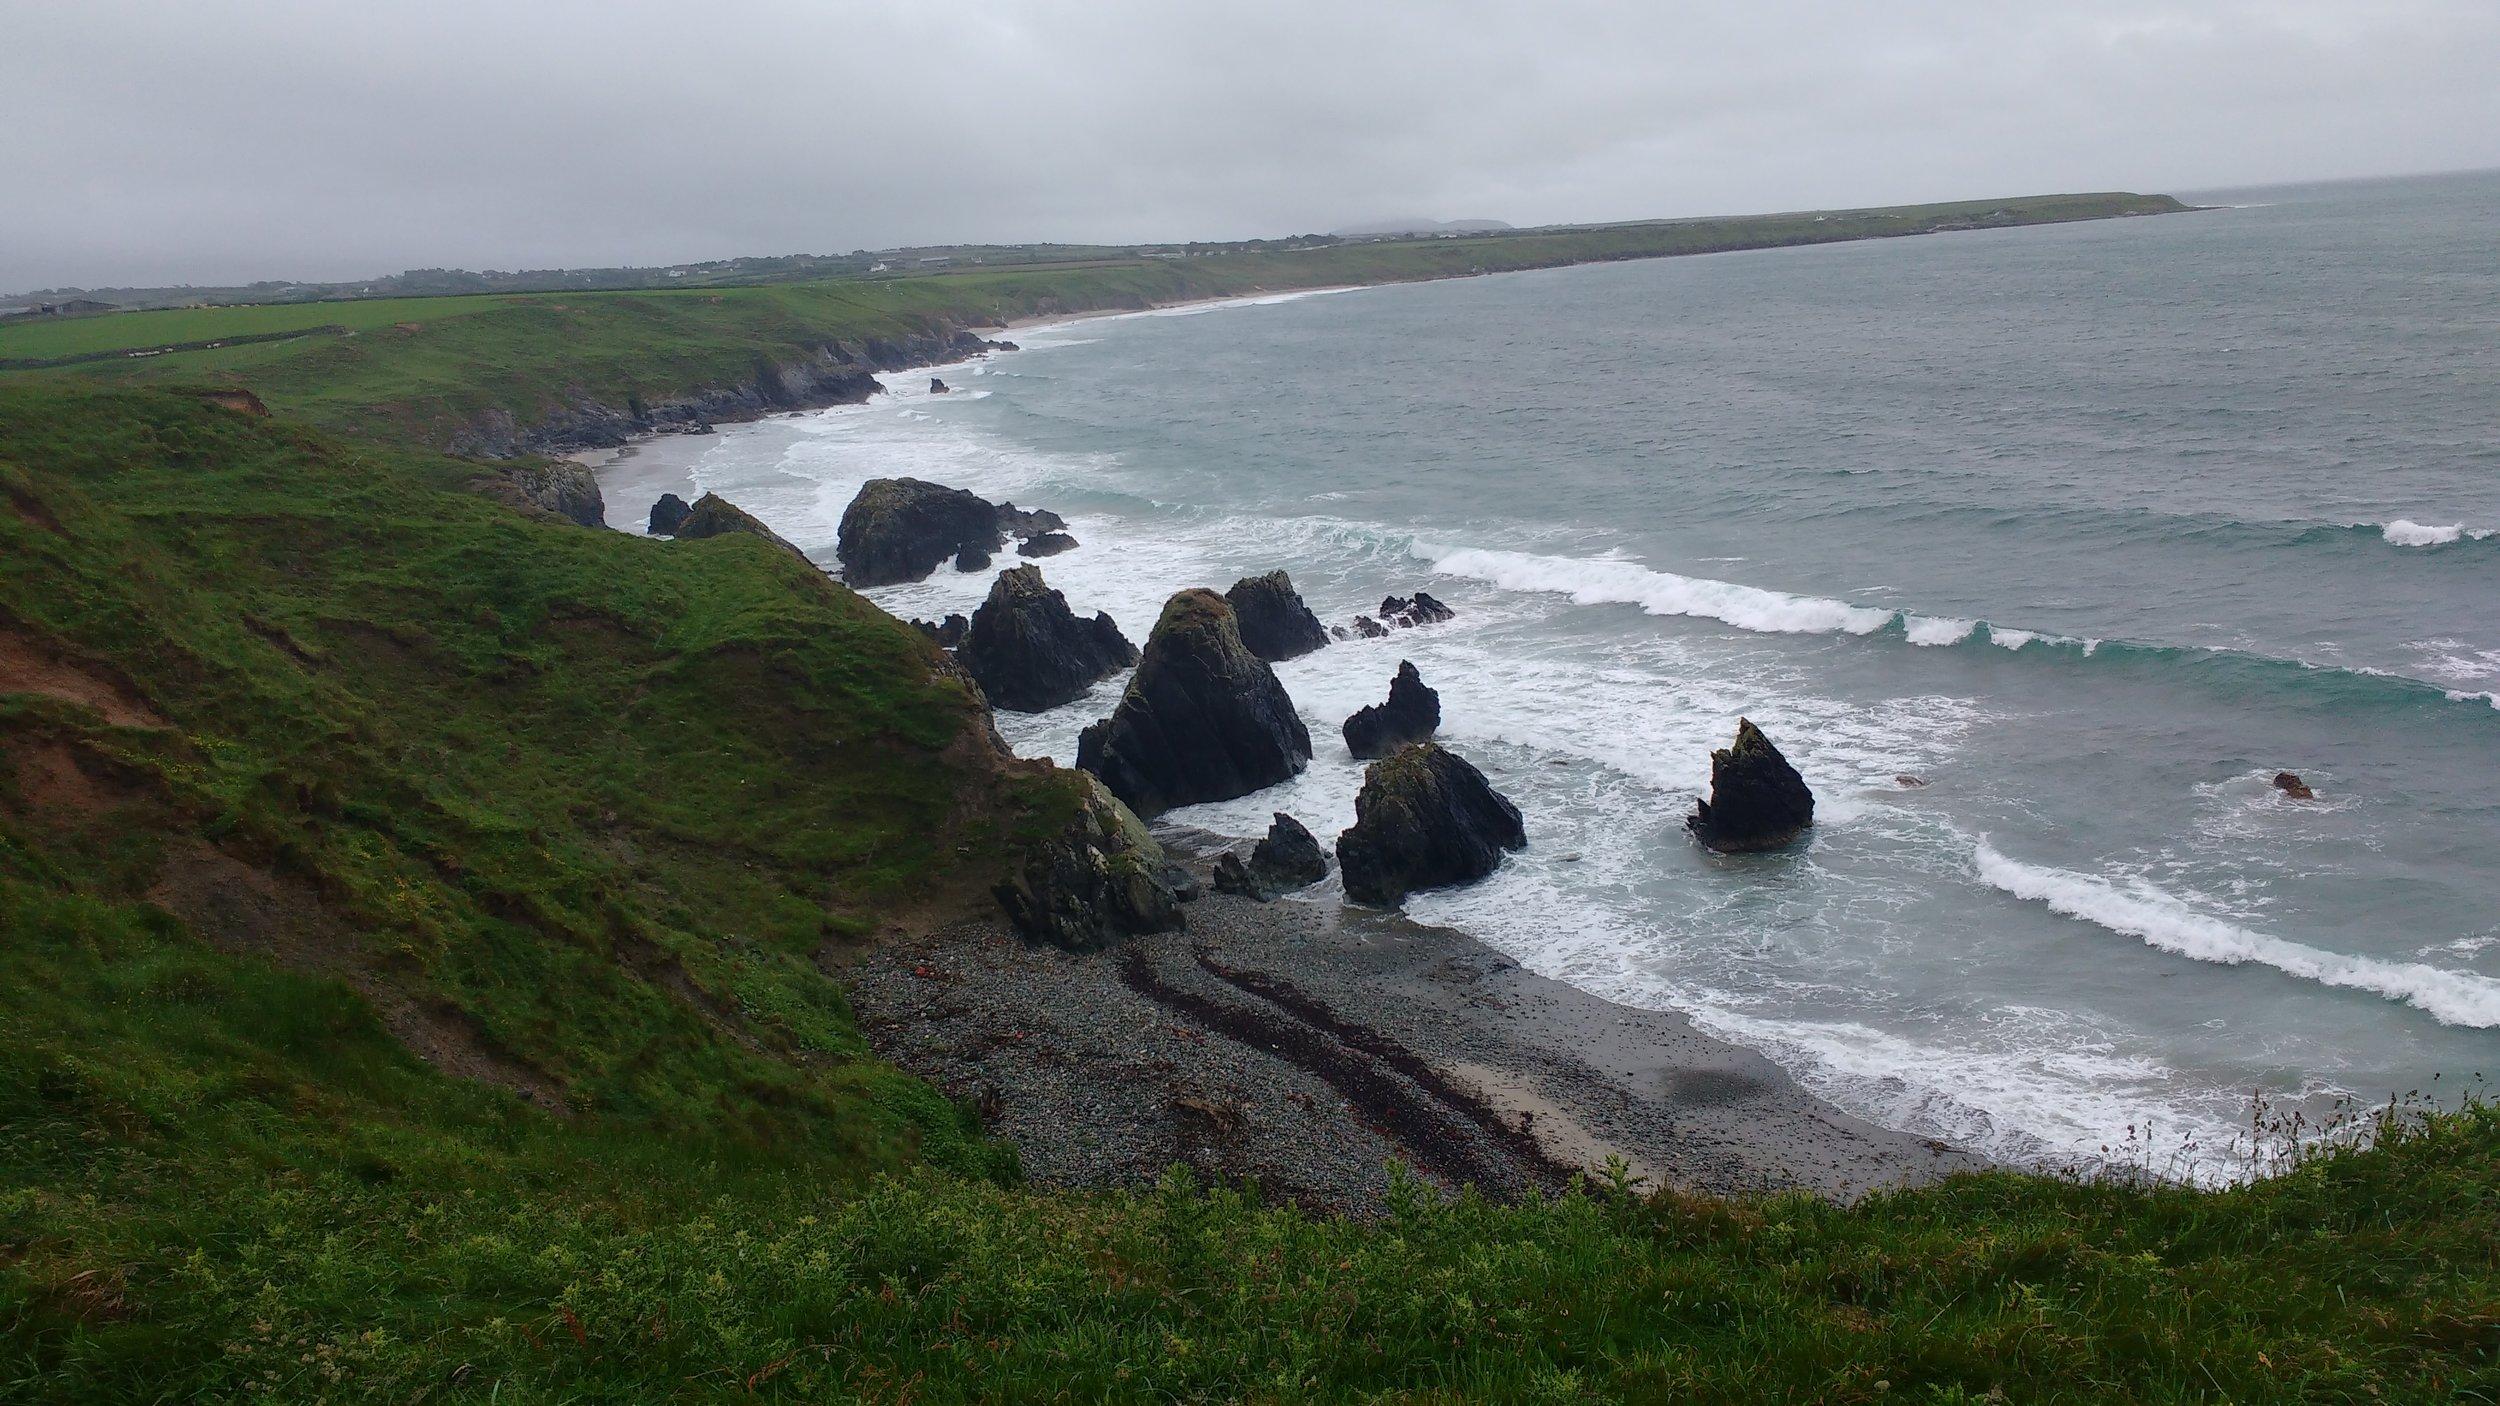 North coast of the Lleyn peninsula